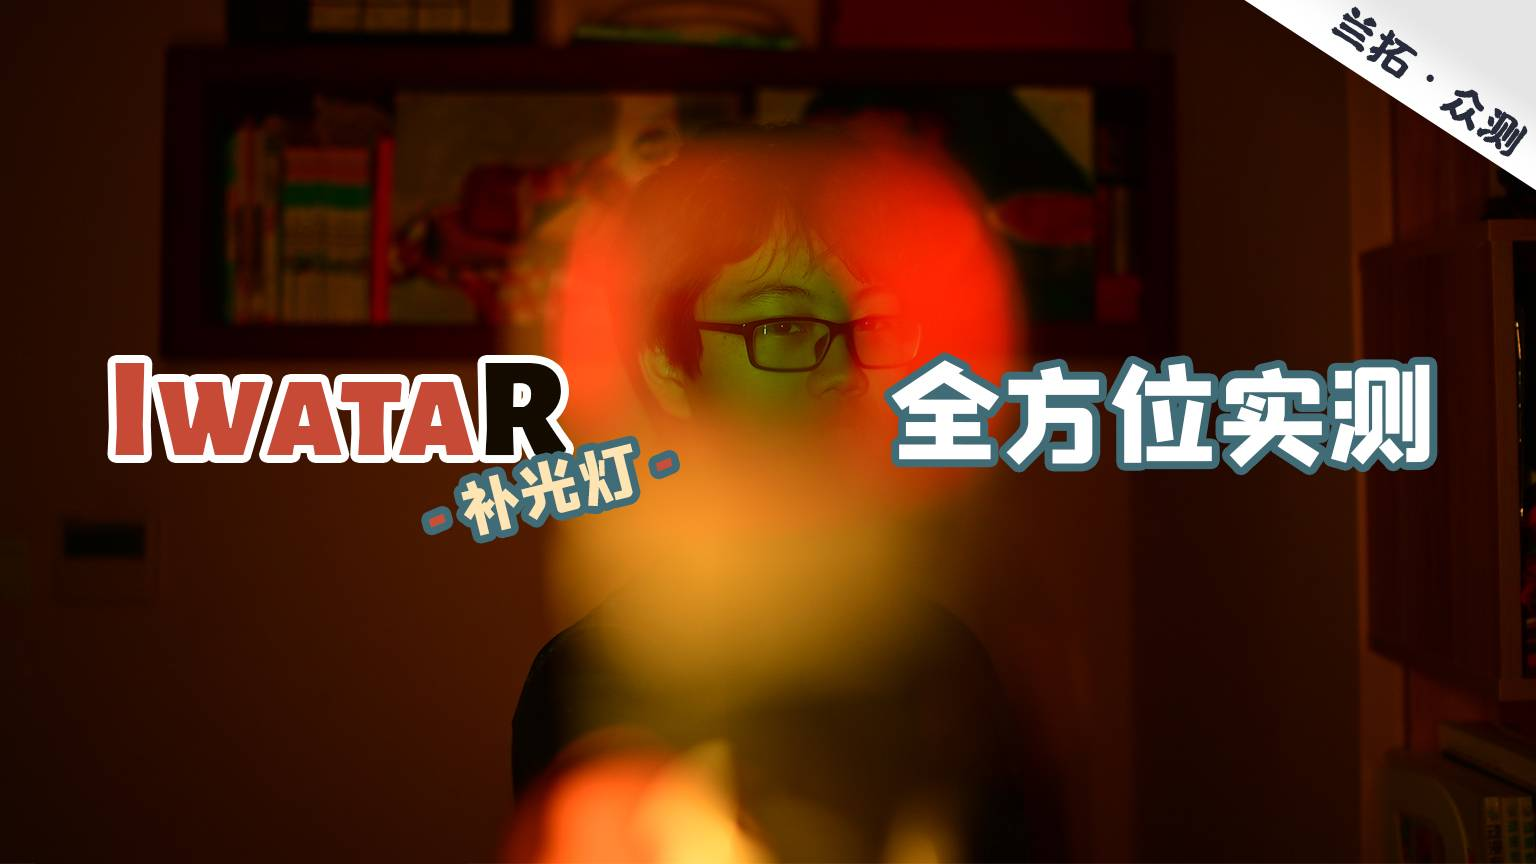 【iwata Master R全彩灯】最全面最惊喜的补光灯实测 —— By ArakiW